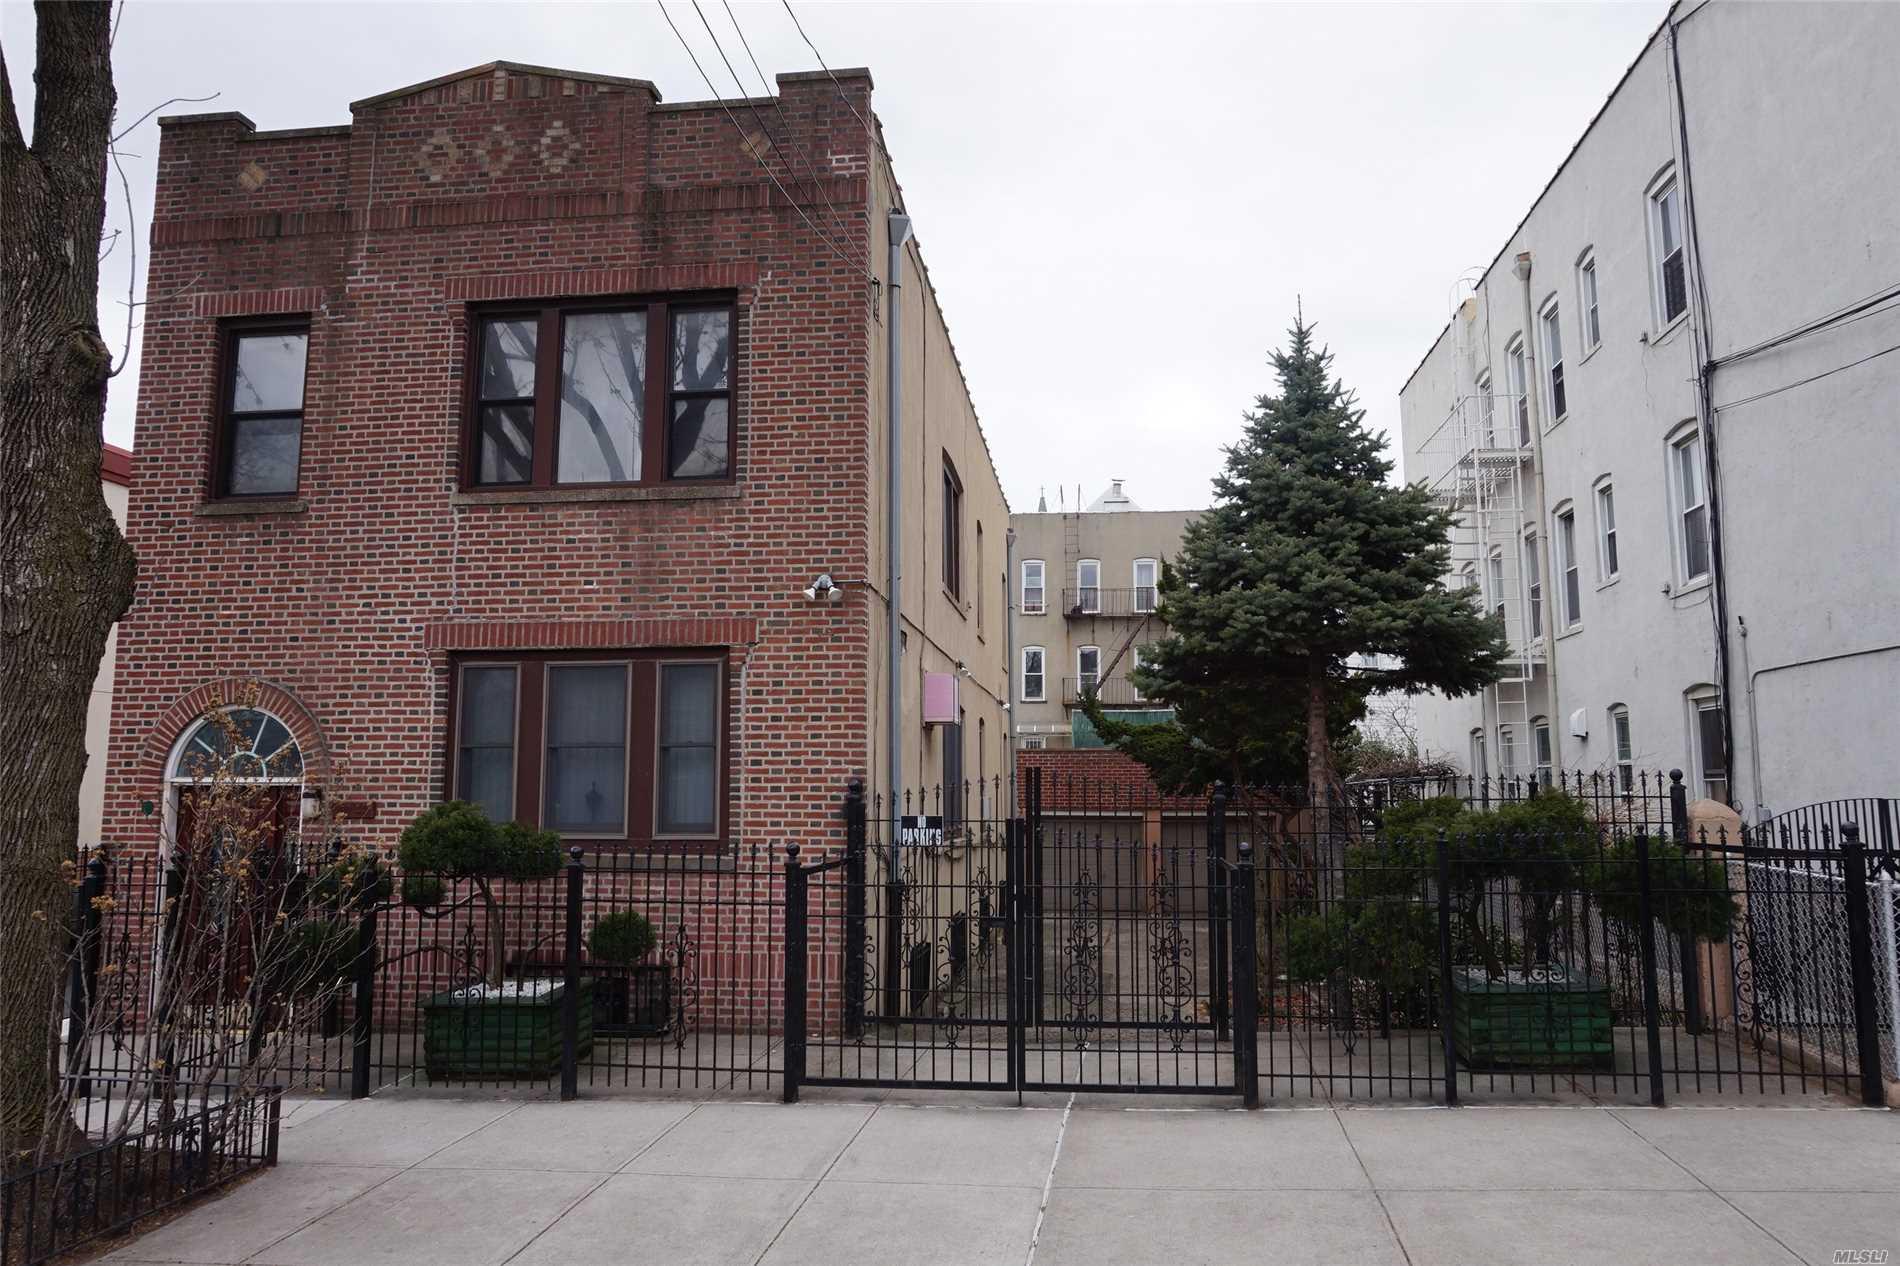 Property for sale at 50-44 39th Street, Sunnyside NY 11104, Sunnyside,  New York 11104